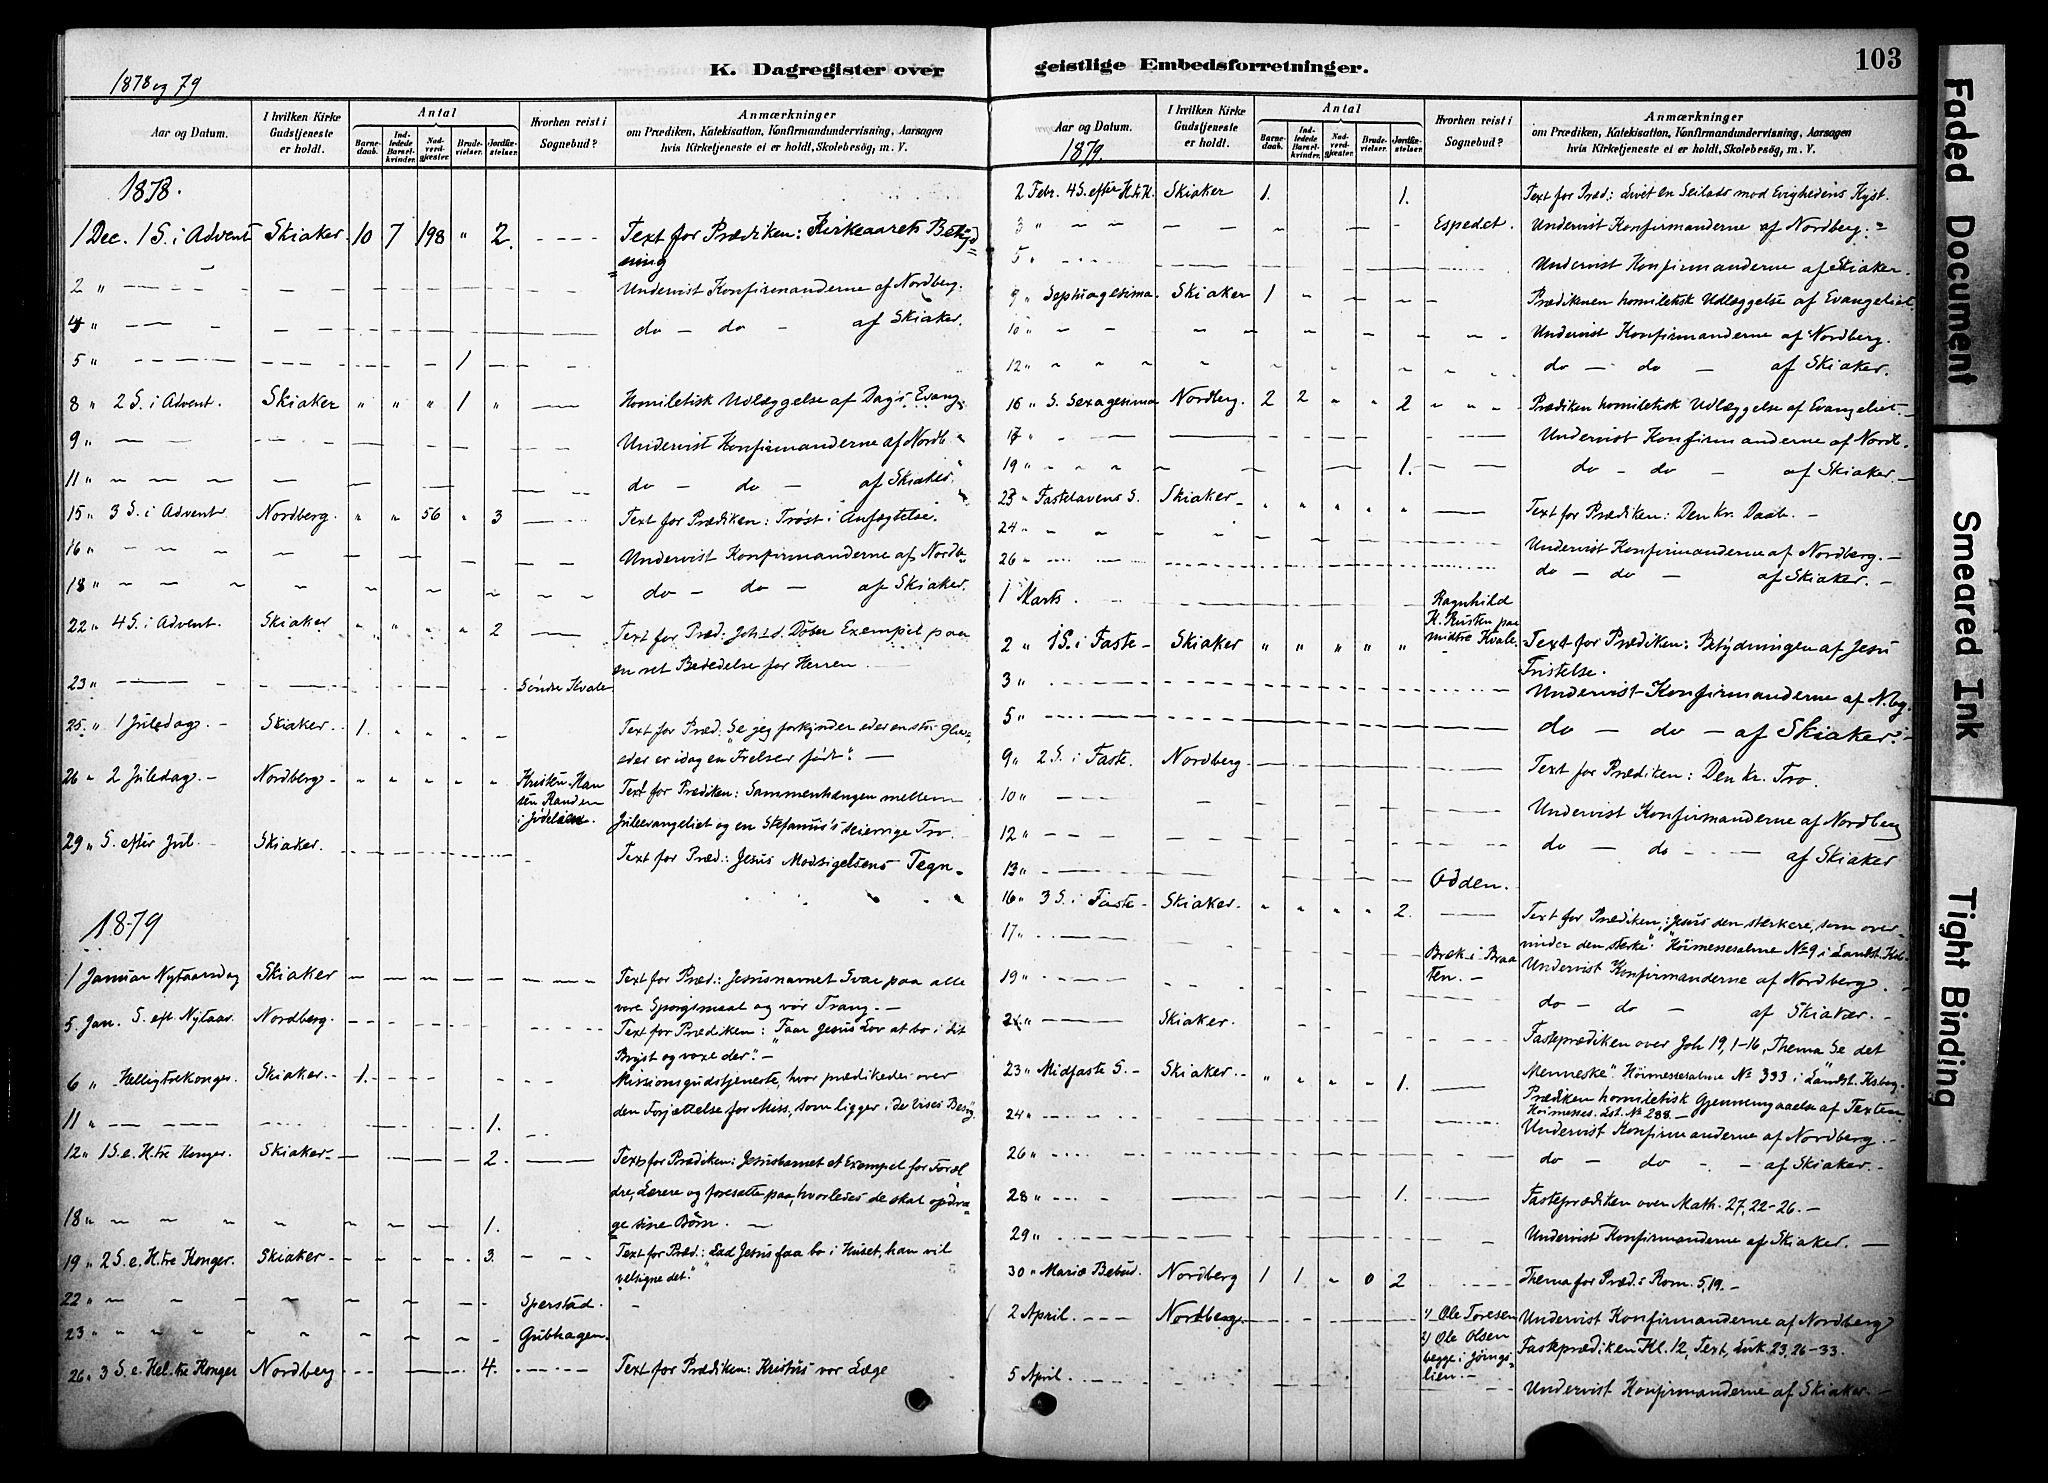 SAH, Skjåk prestekontor, Ministerialbok nr. 2, 1878-1907, s. 103